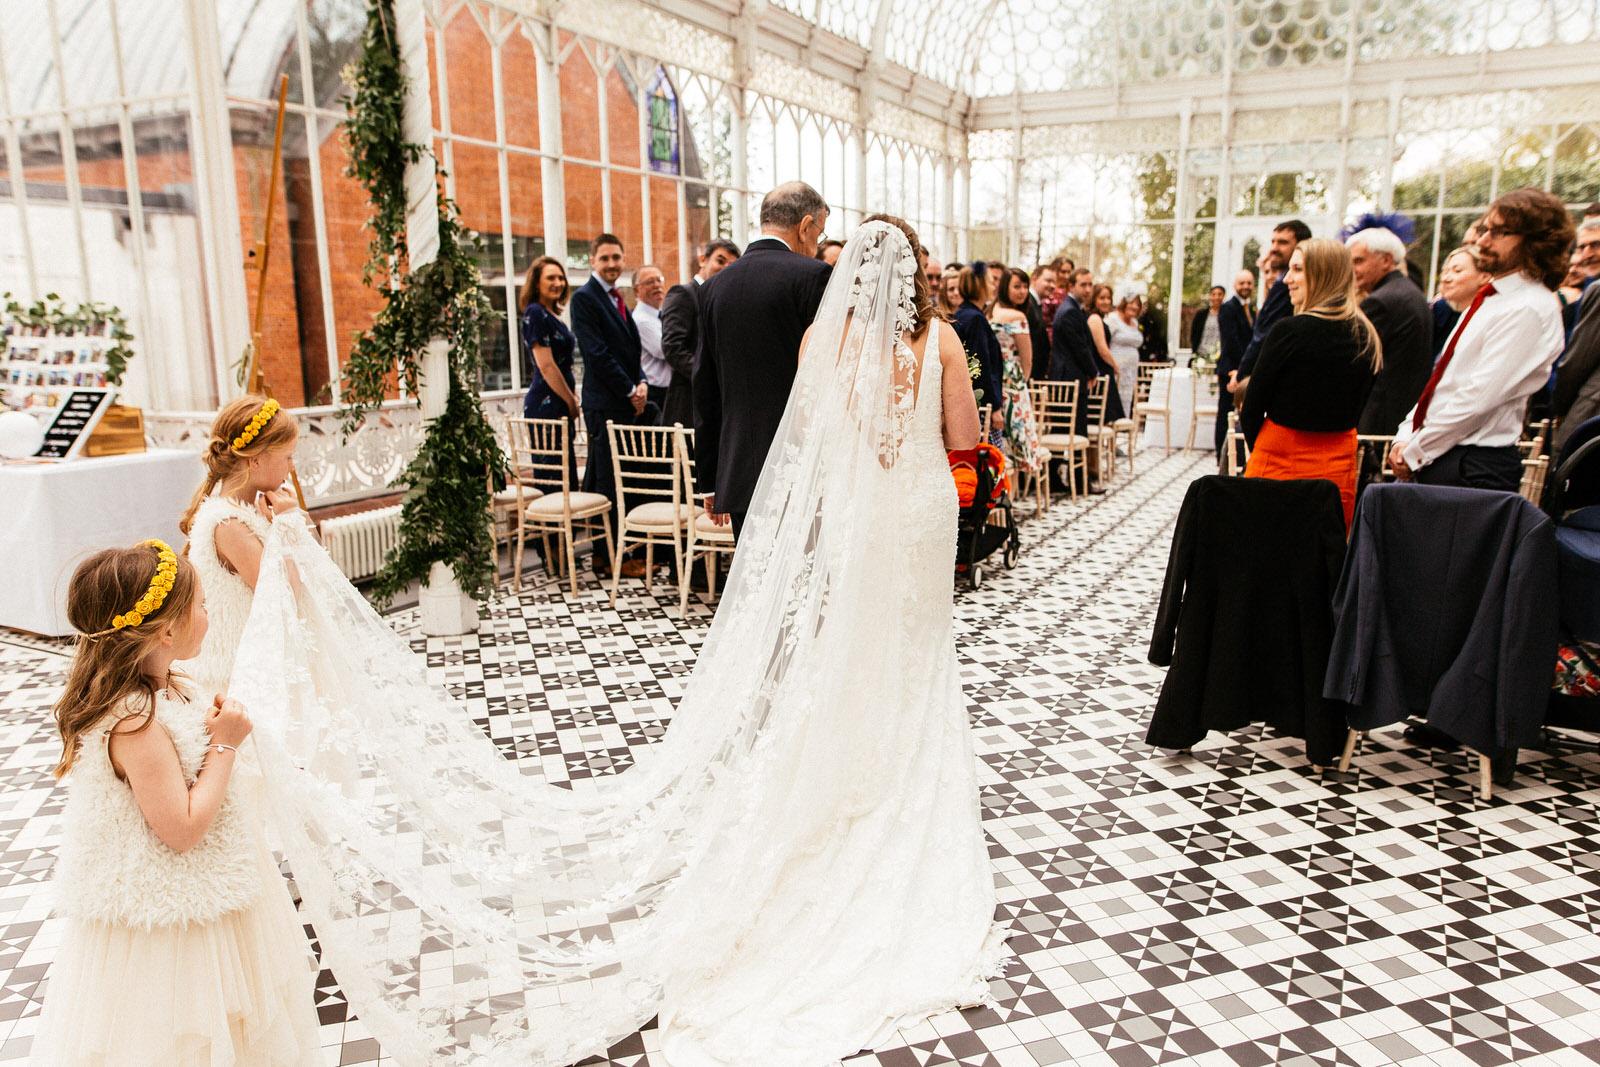 Jenni-and-James-Wedding-Highlights-9.jpg